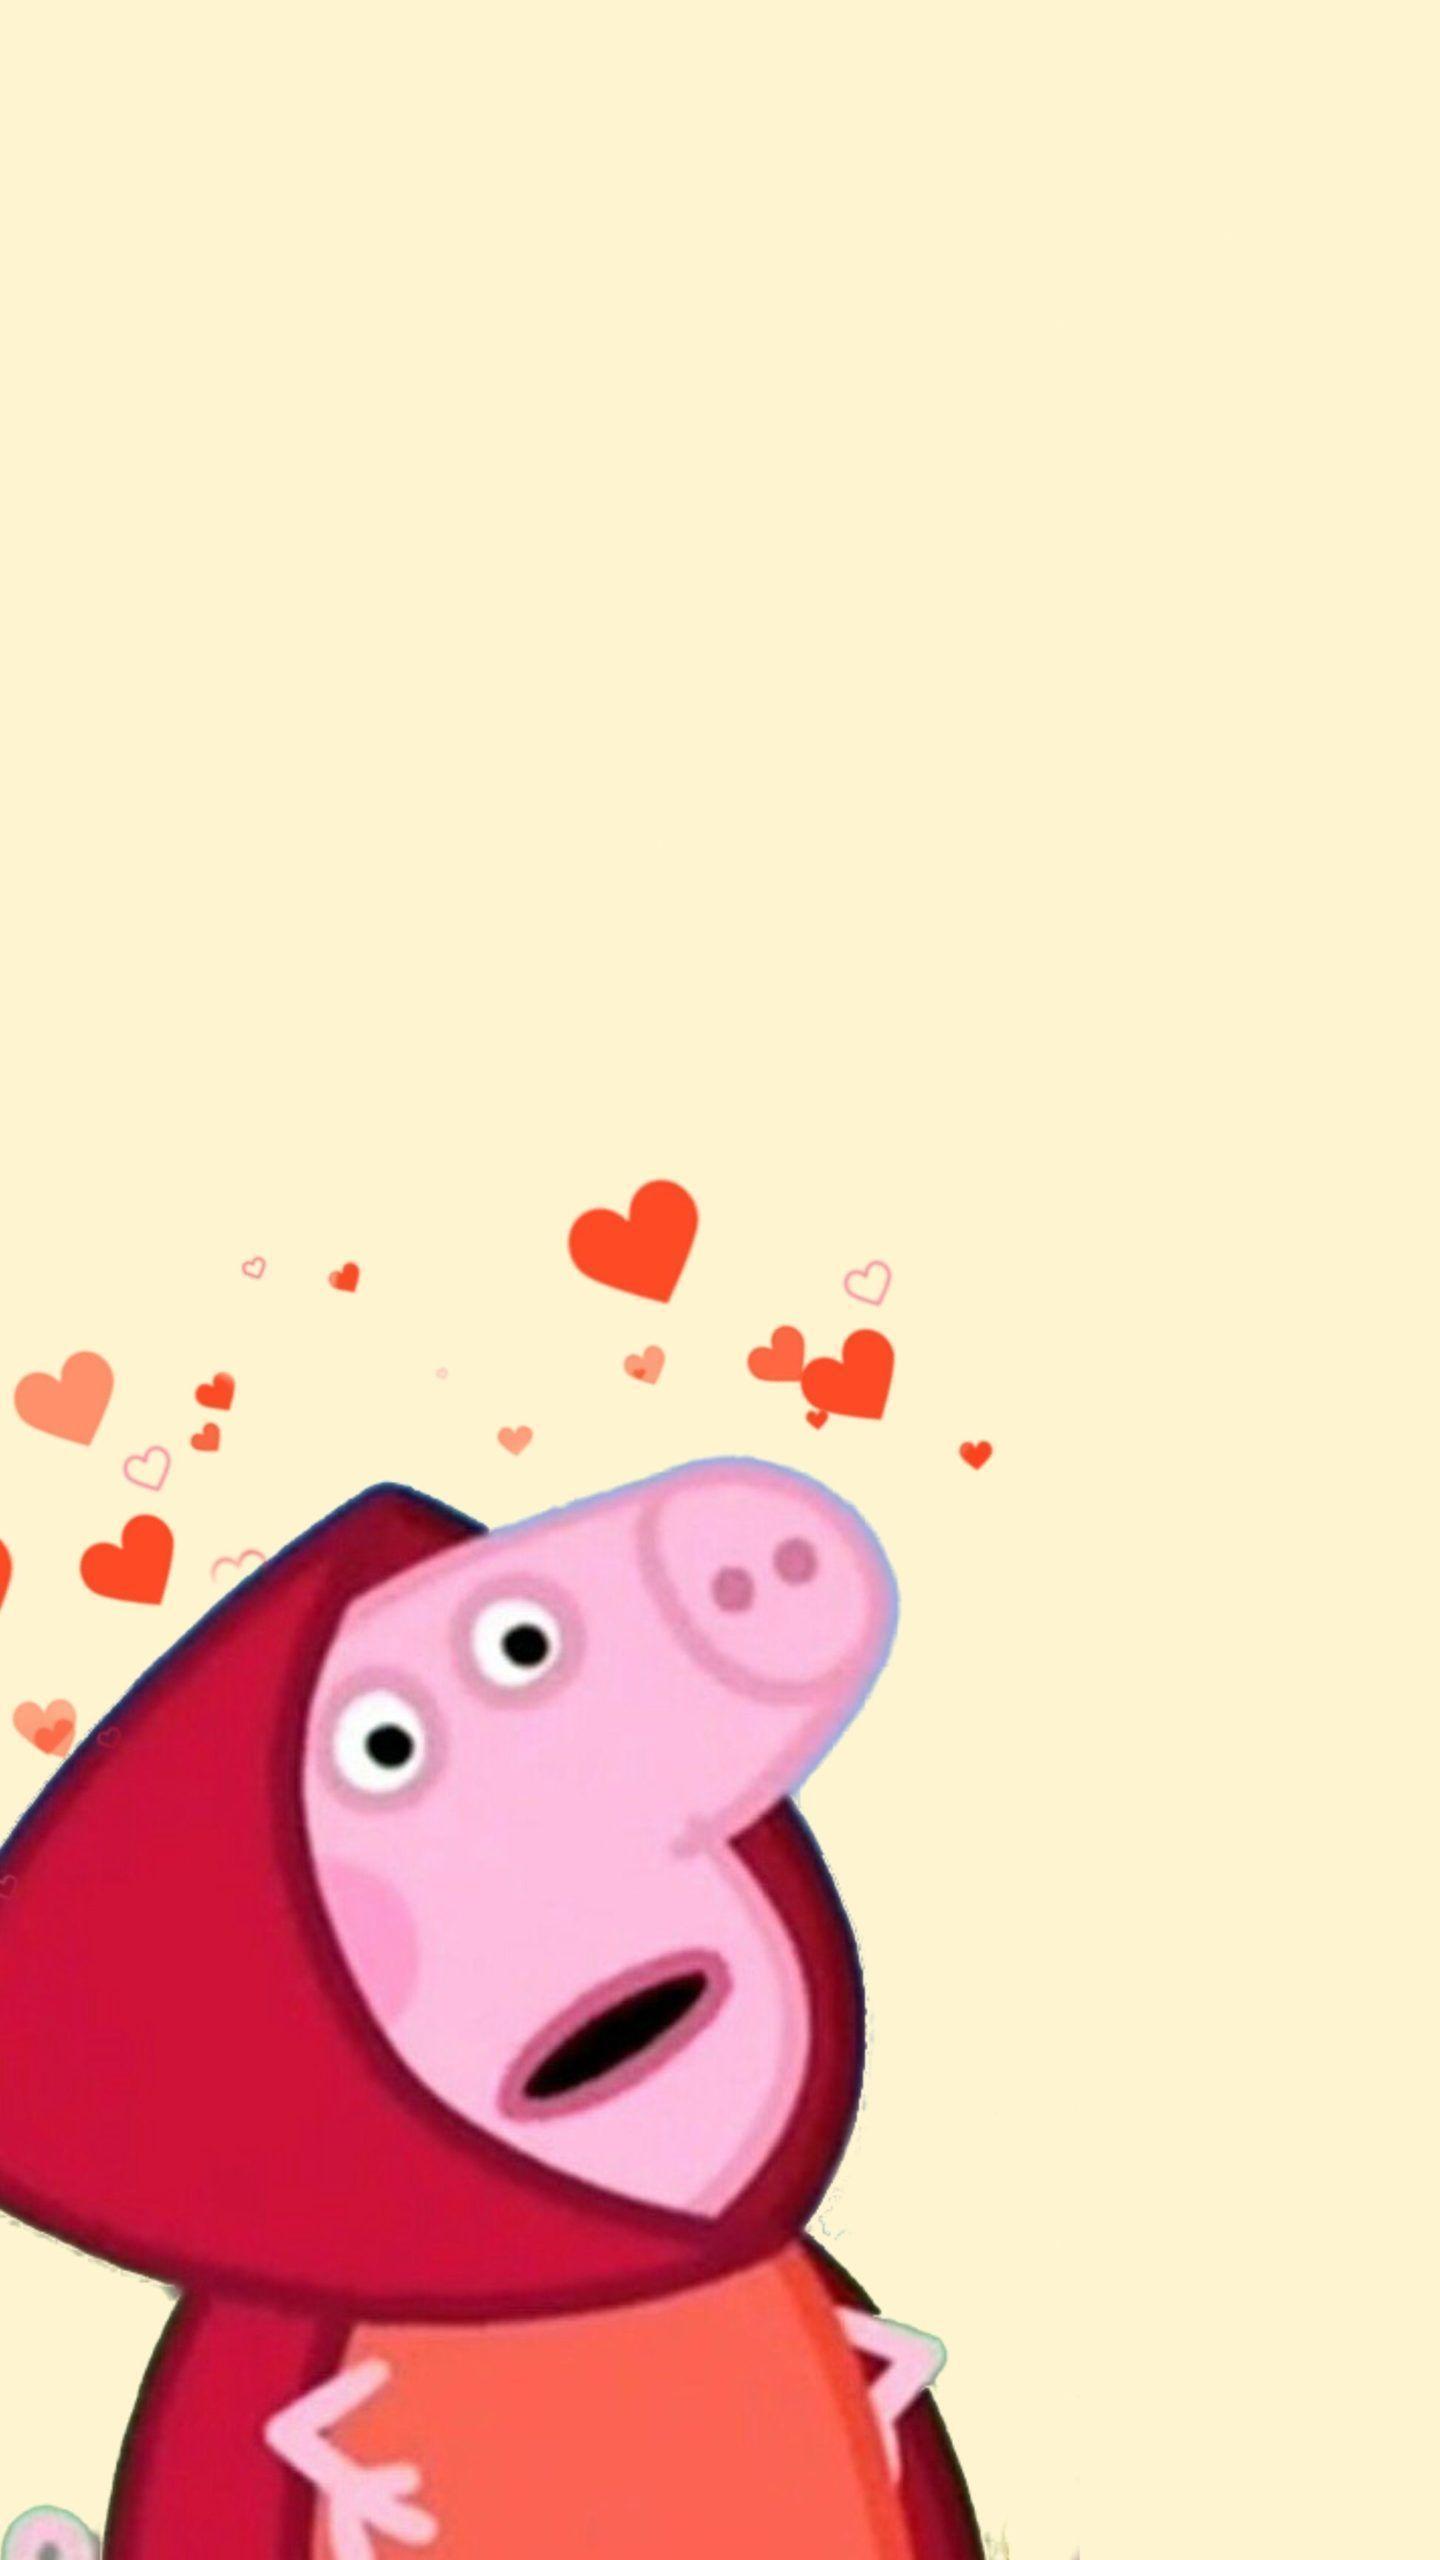 Peppapig Wallpaper Iphone Cute Pig Wallpaper Peppa Pig Wallpaper